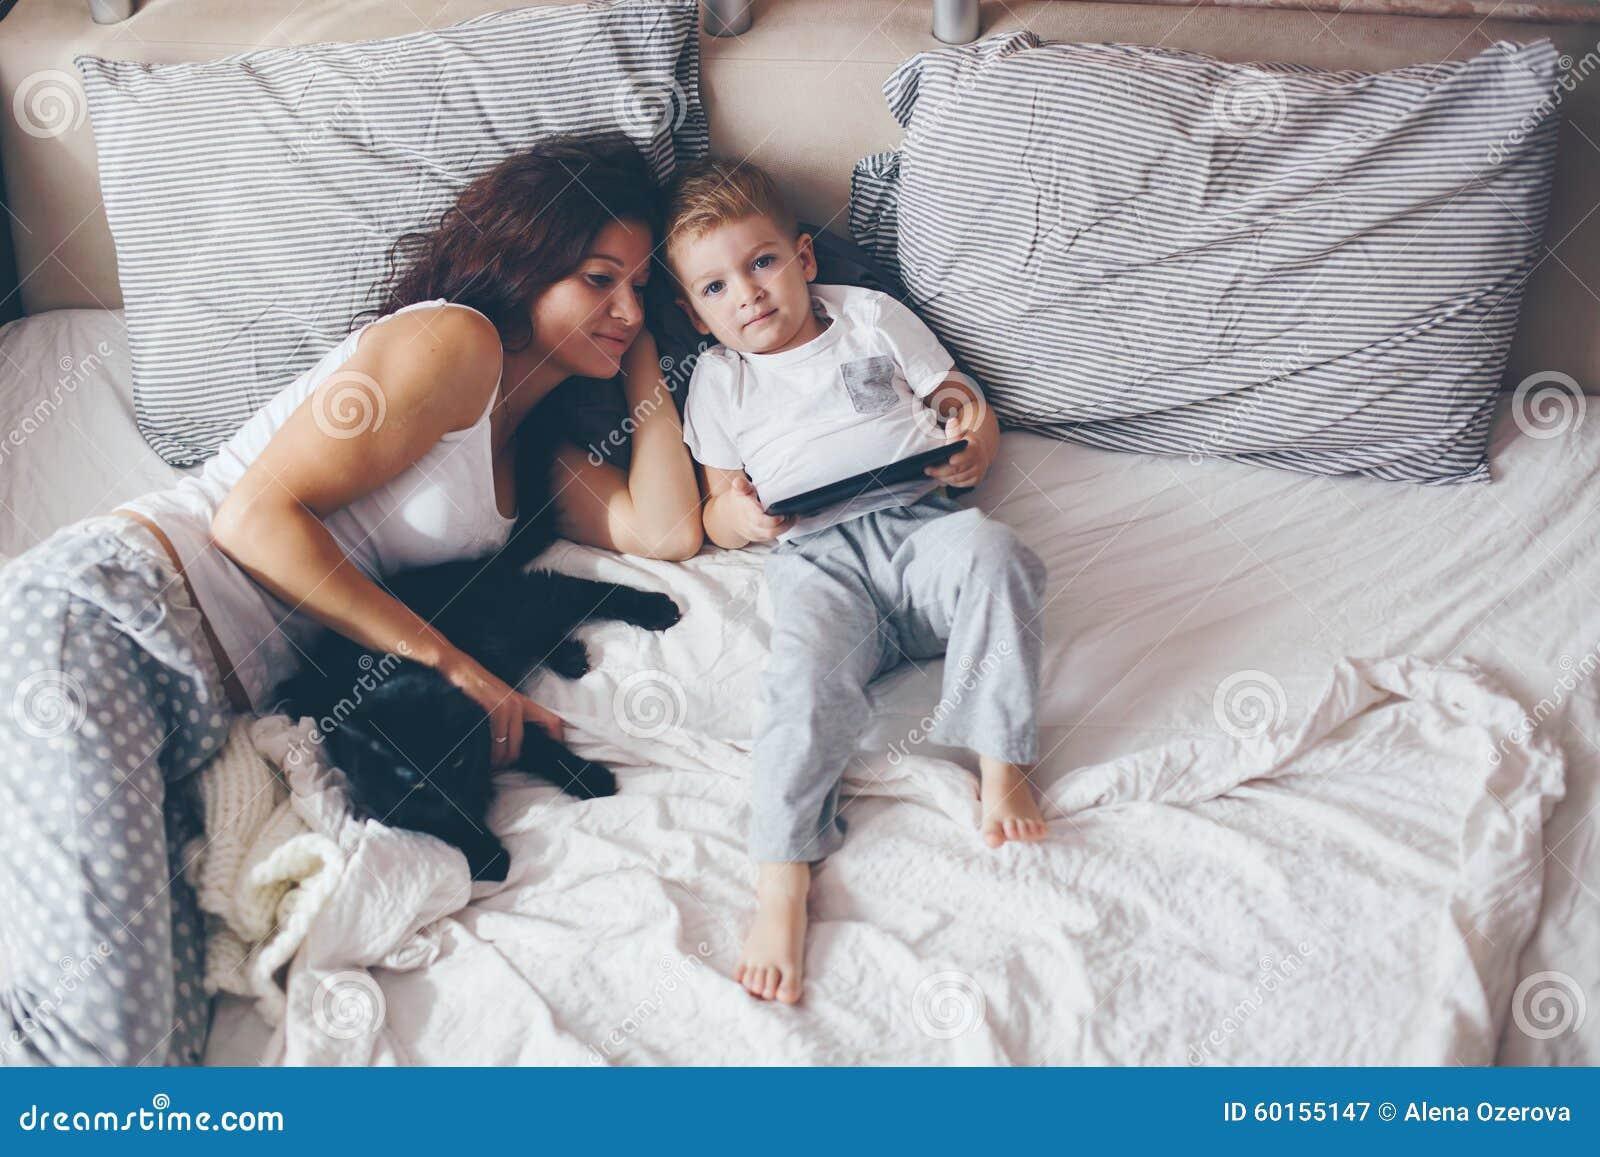 Раздел маму сын 1 фотография